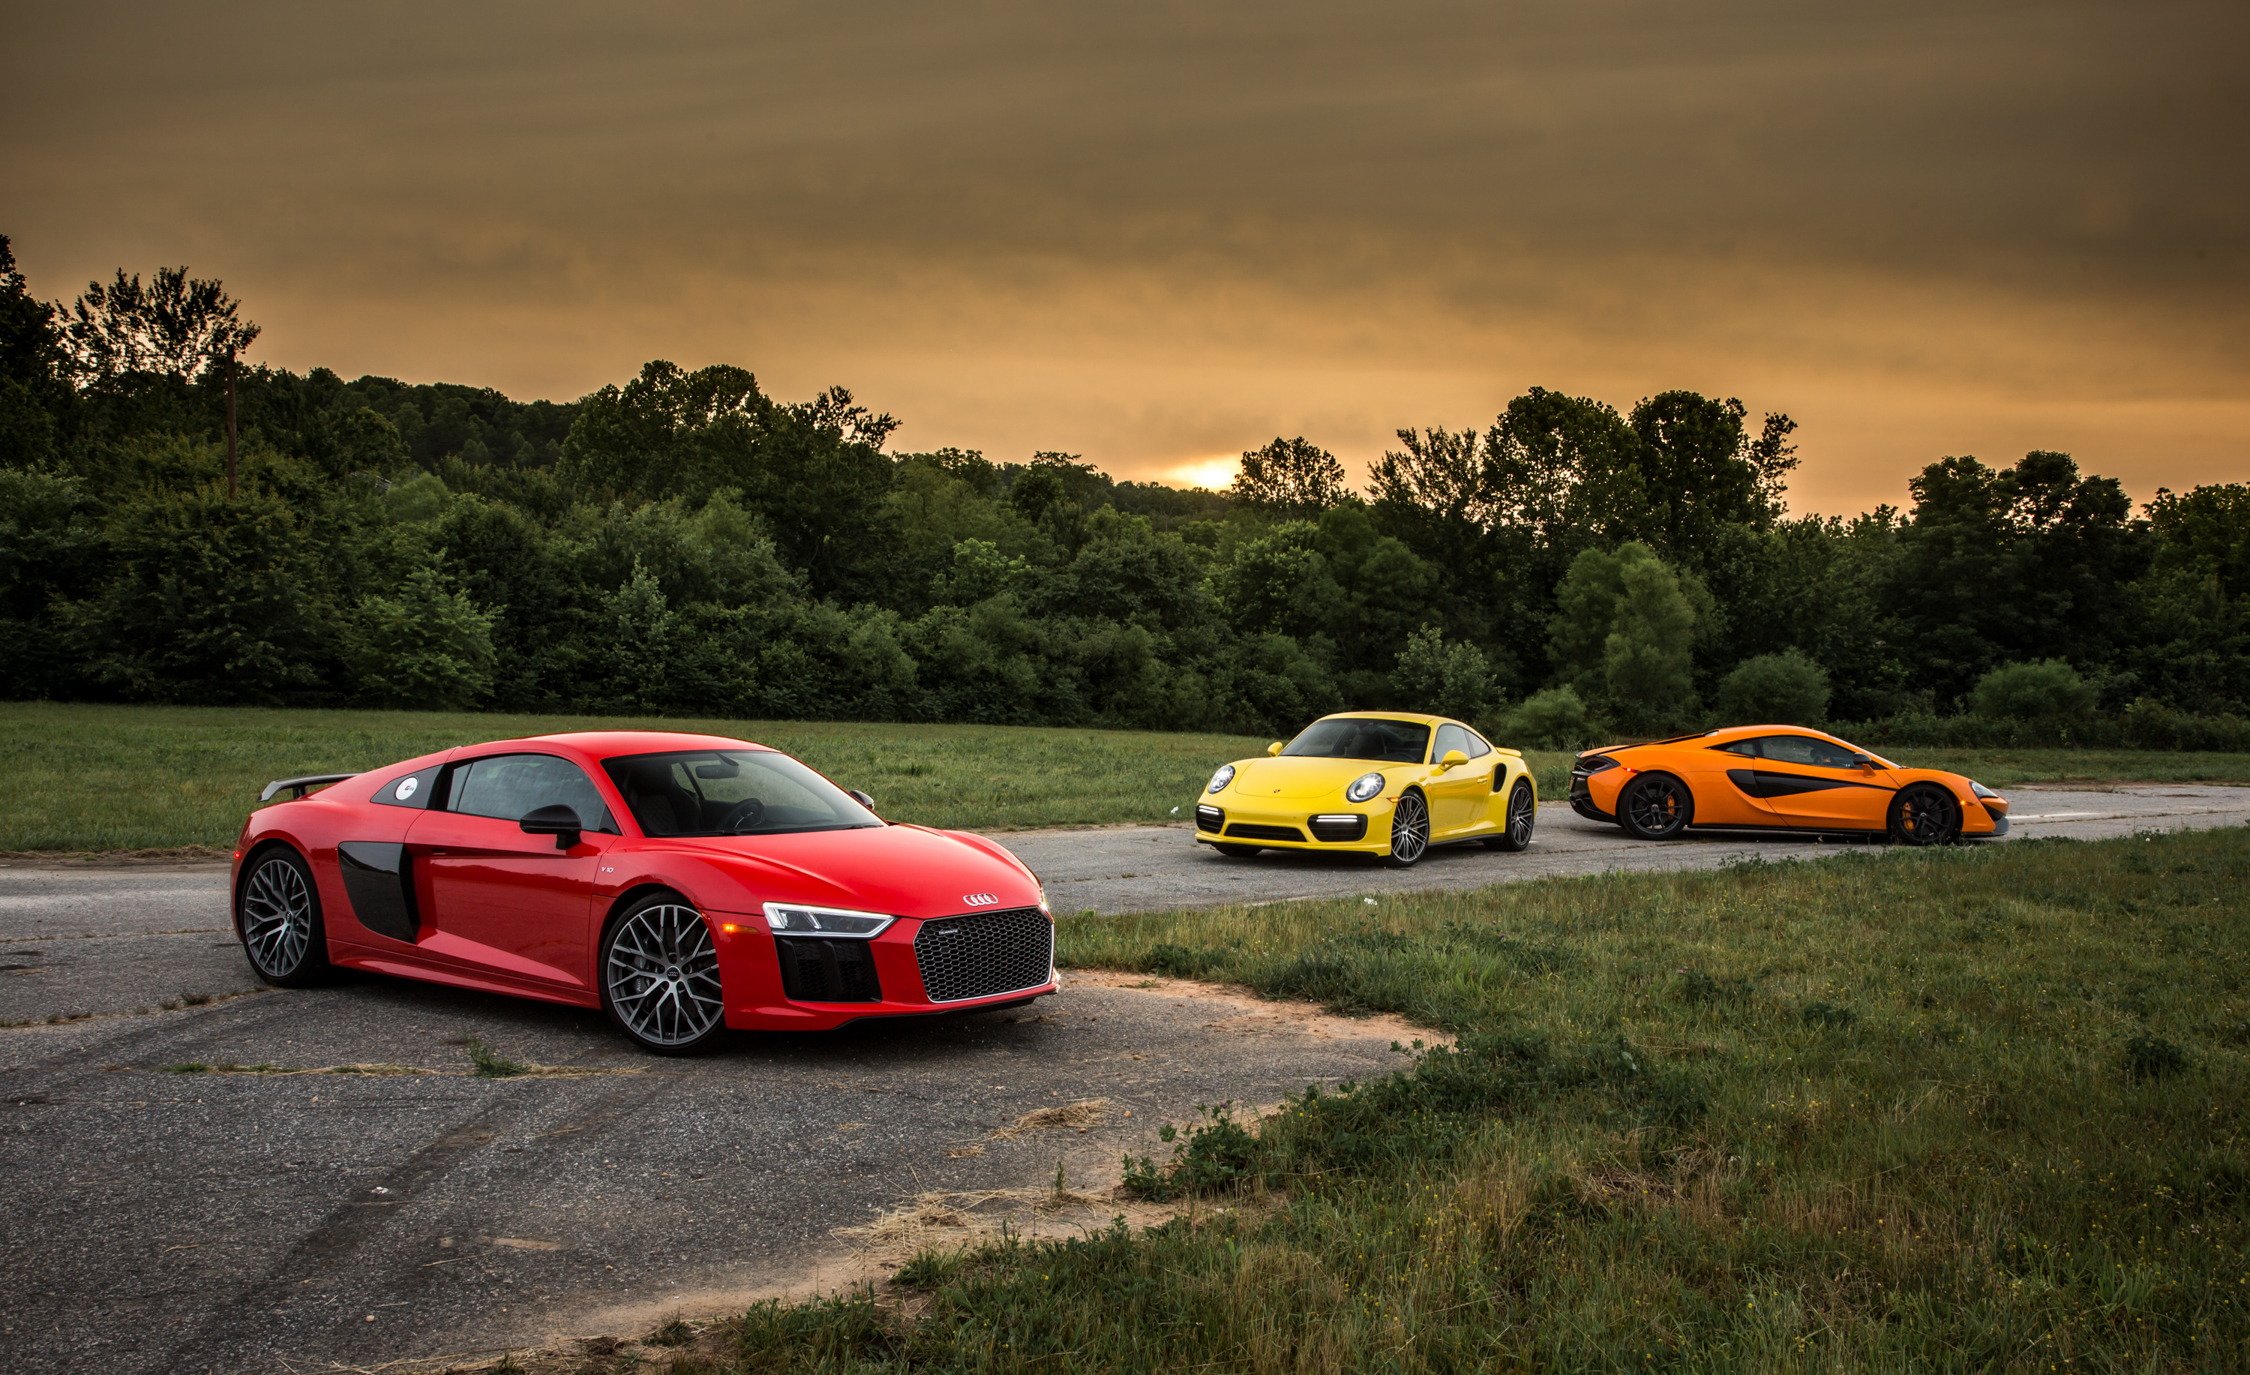 2017 Audi R8 V 10 Hd Cars 4k Wallpapers Images